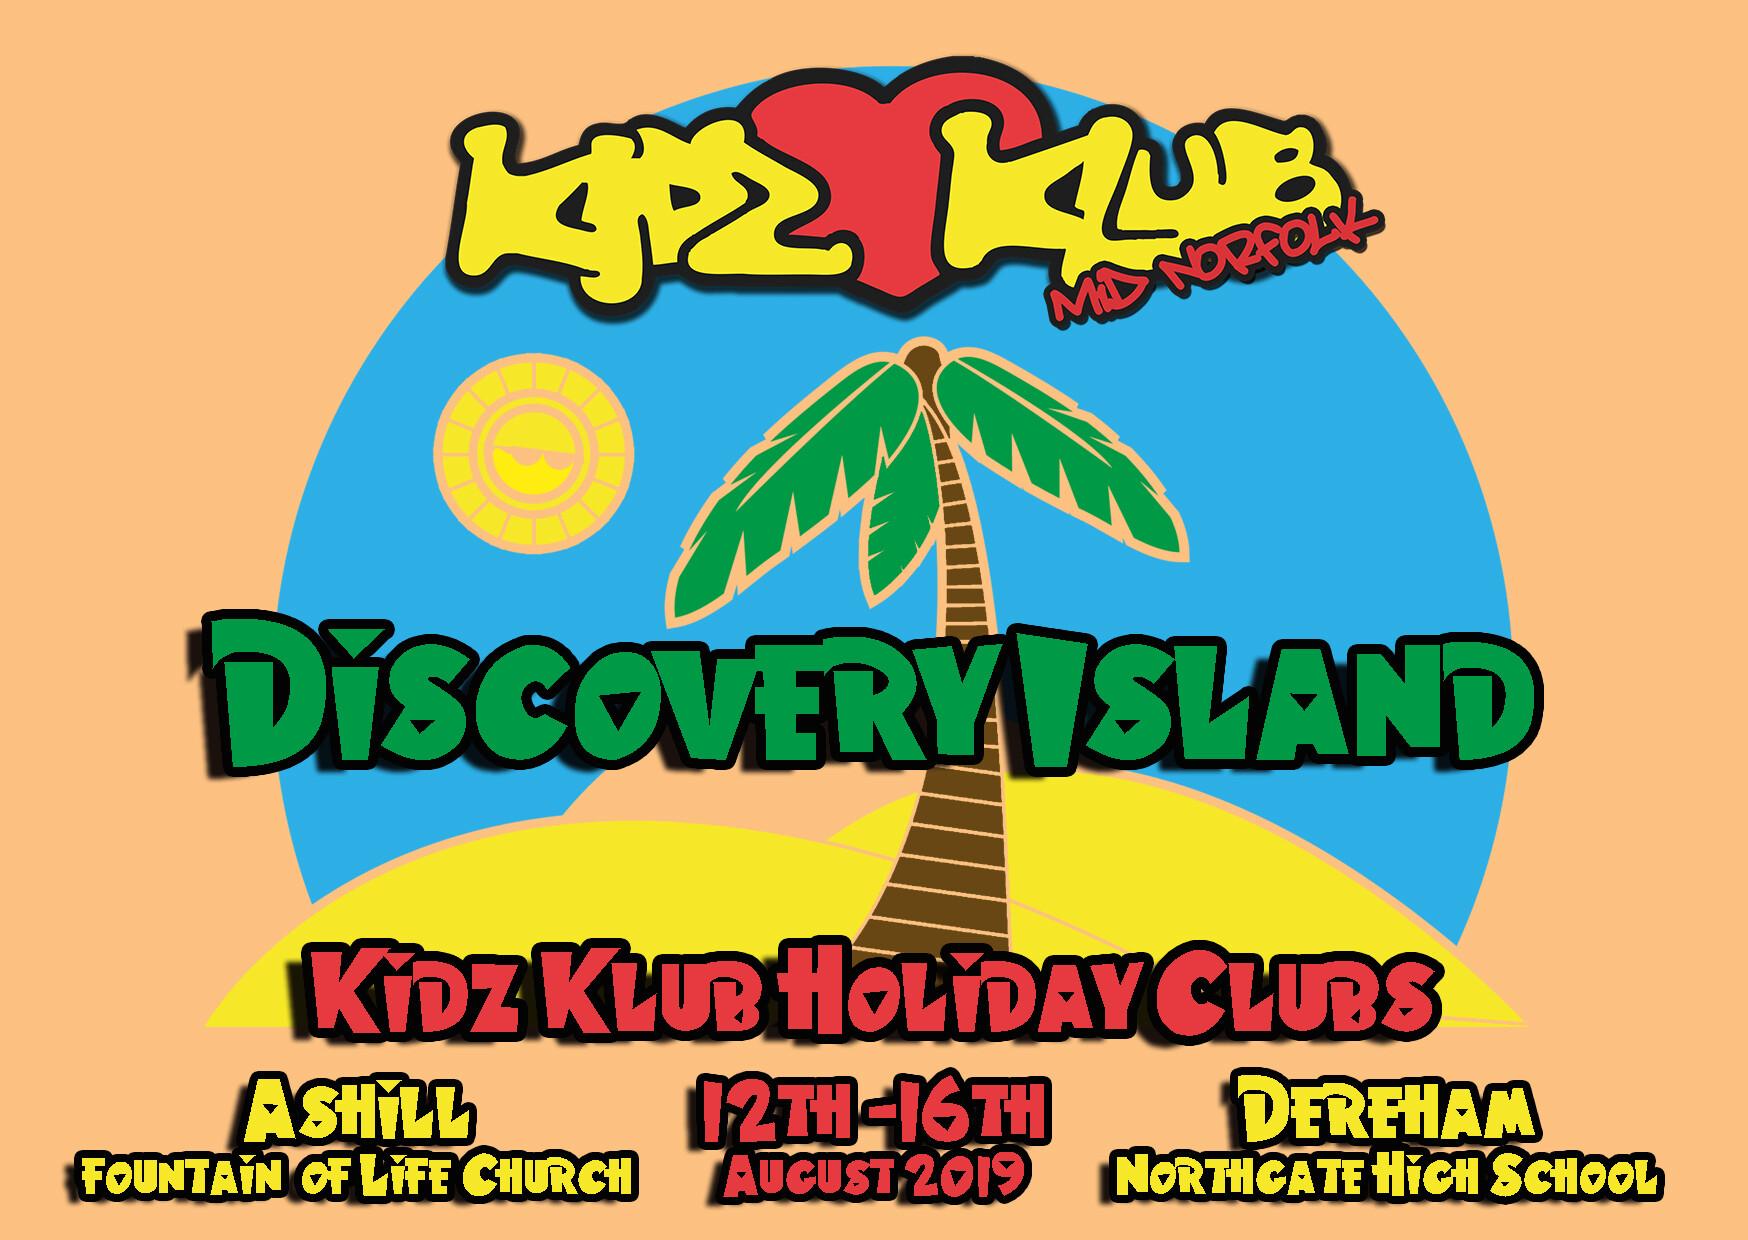 Discovery Island Holiday Club